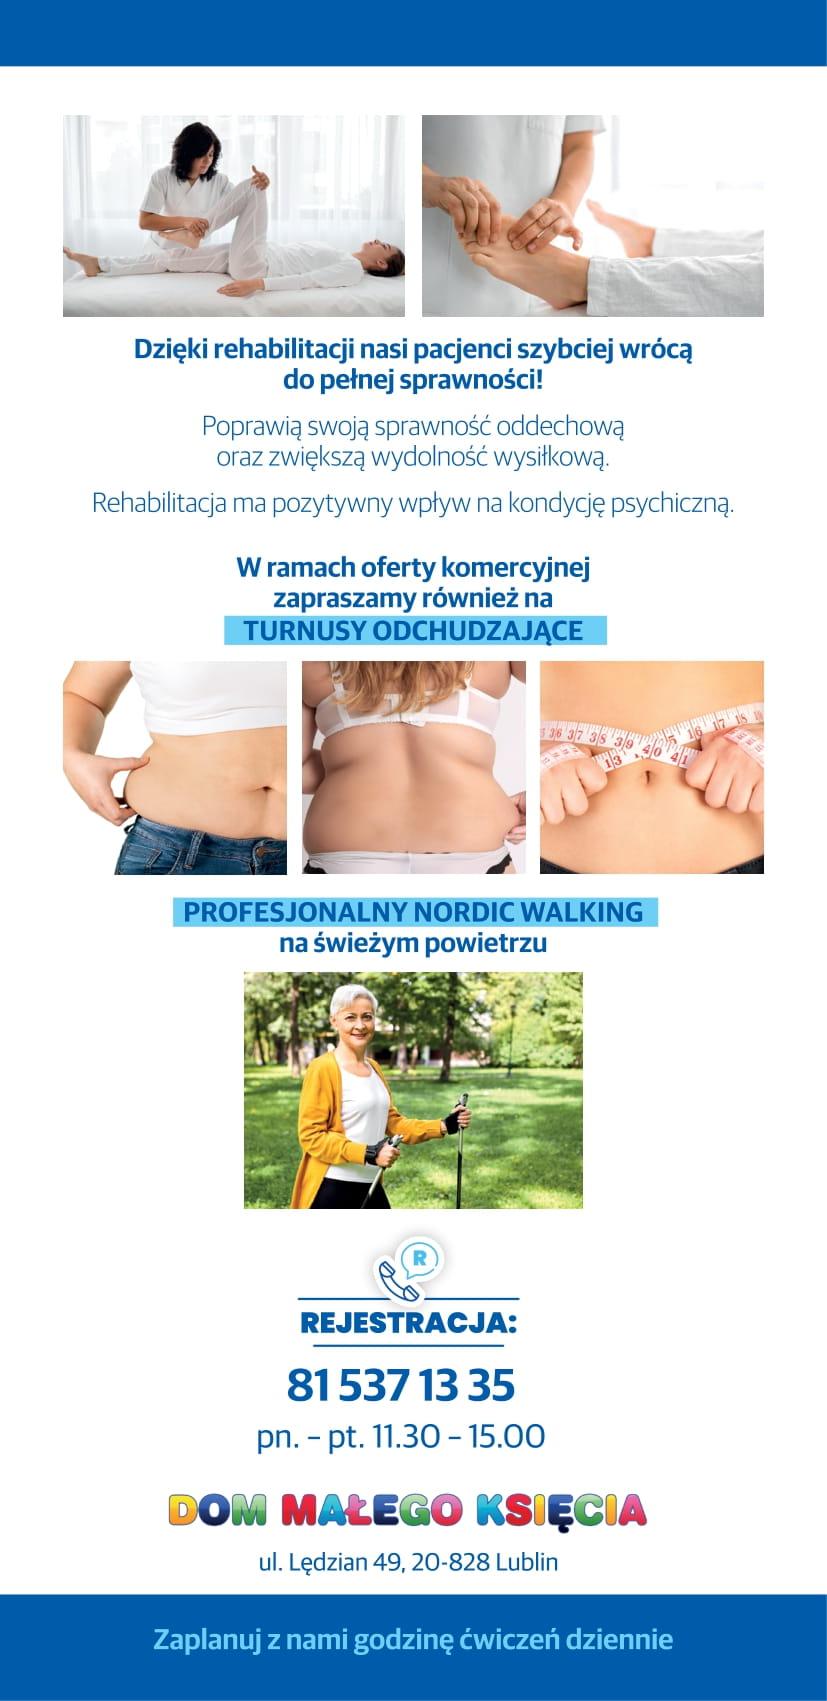 REHABILITACJA Pocovidowa_ulotka 2xDL_v2-2